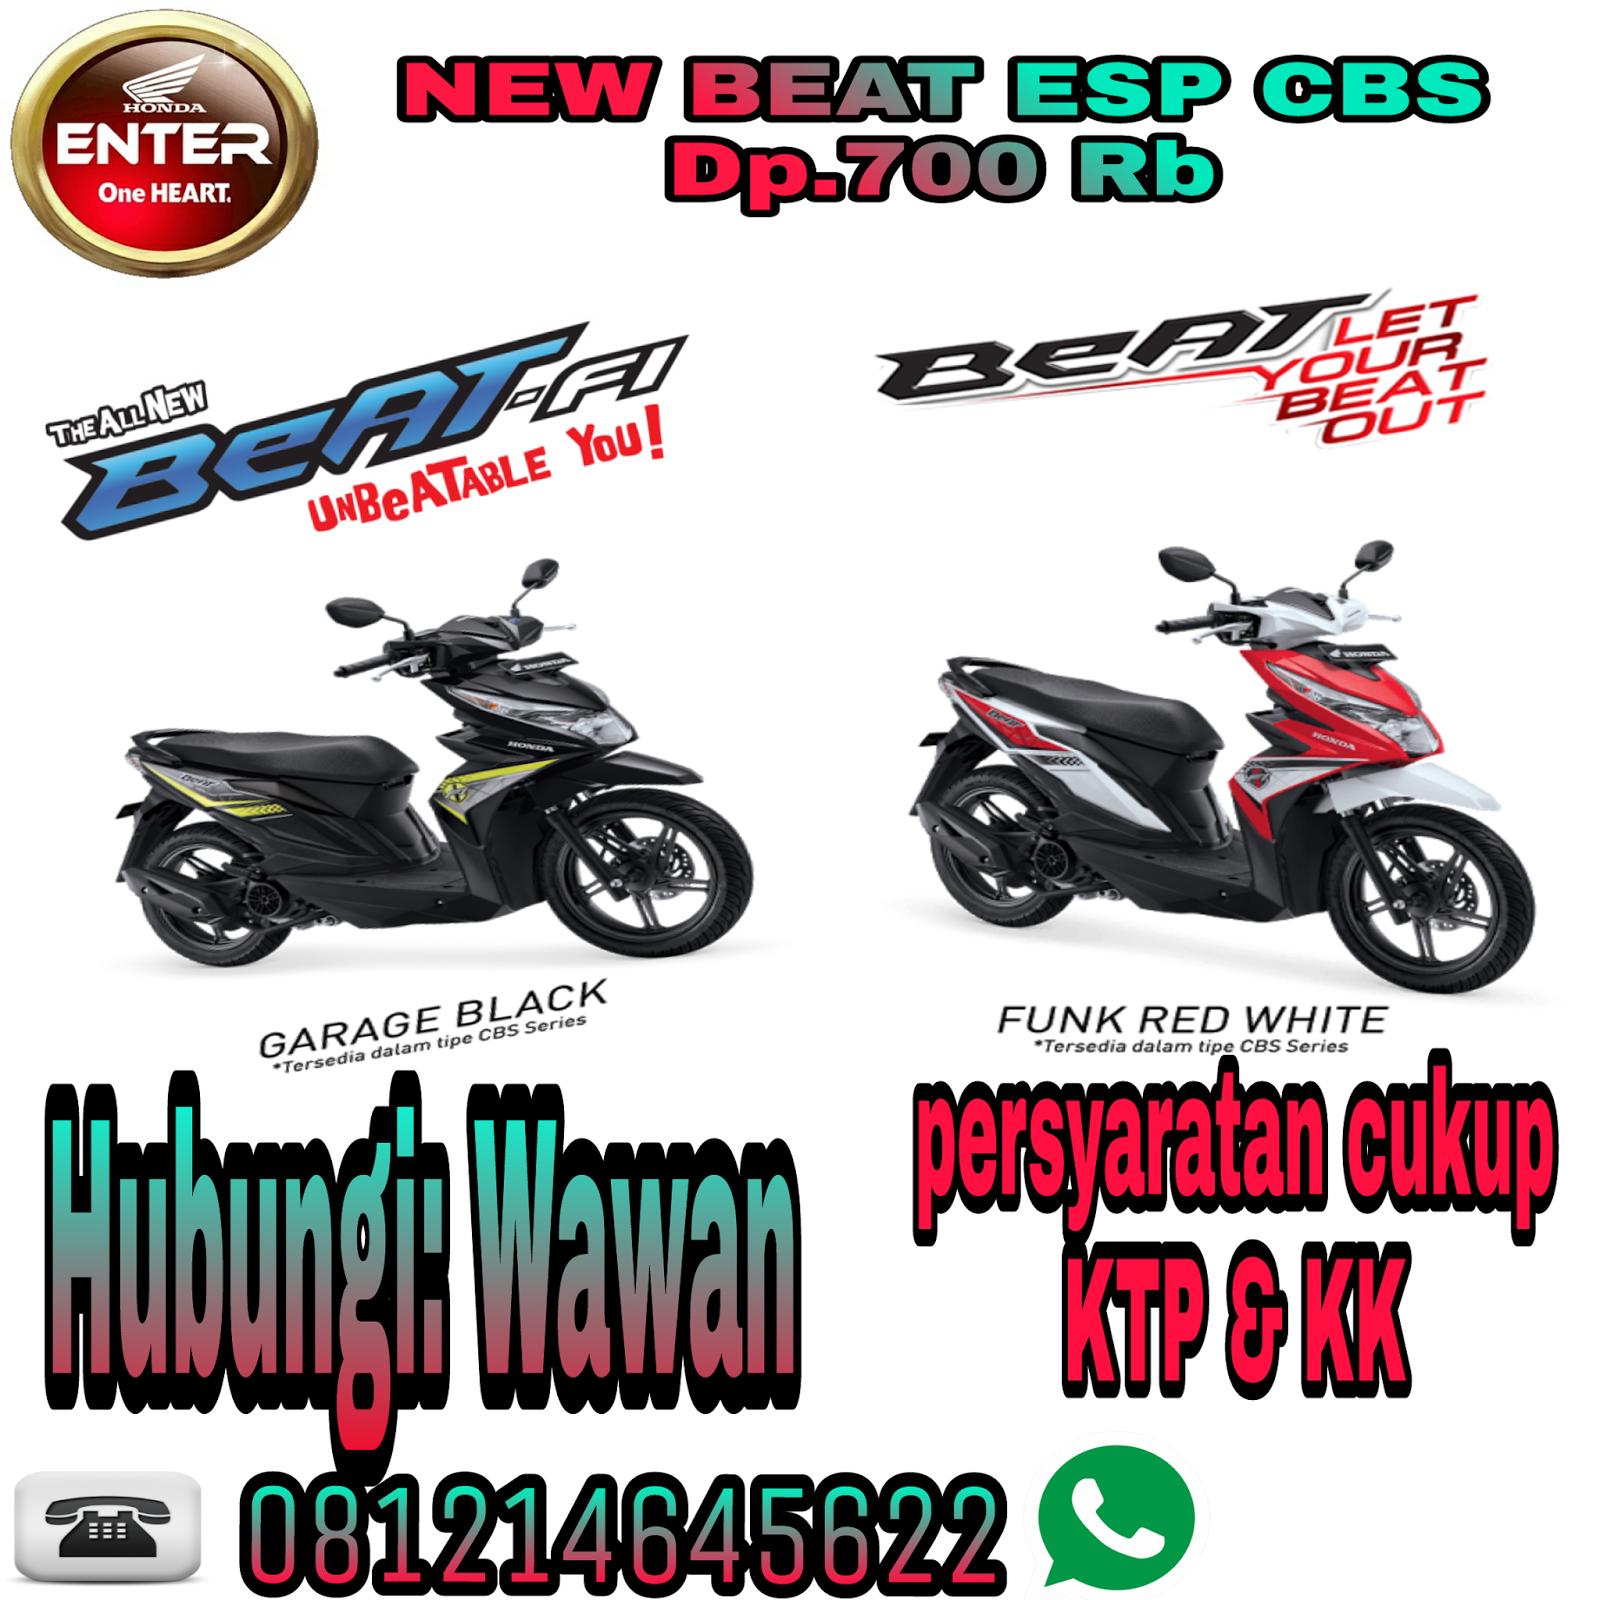 New Beat Esp Cbs Funk Red White List Harga Terkini Dan Terlengkap All Sporty Tecno Blue Tangerang